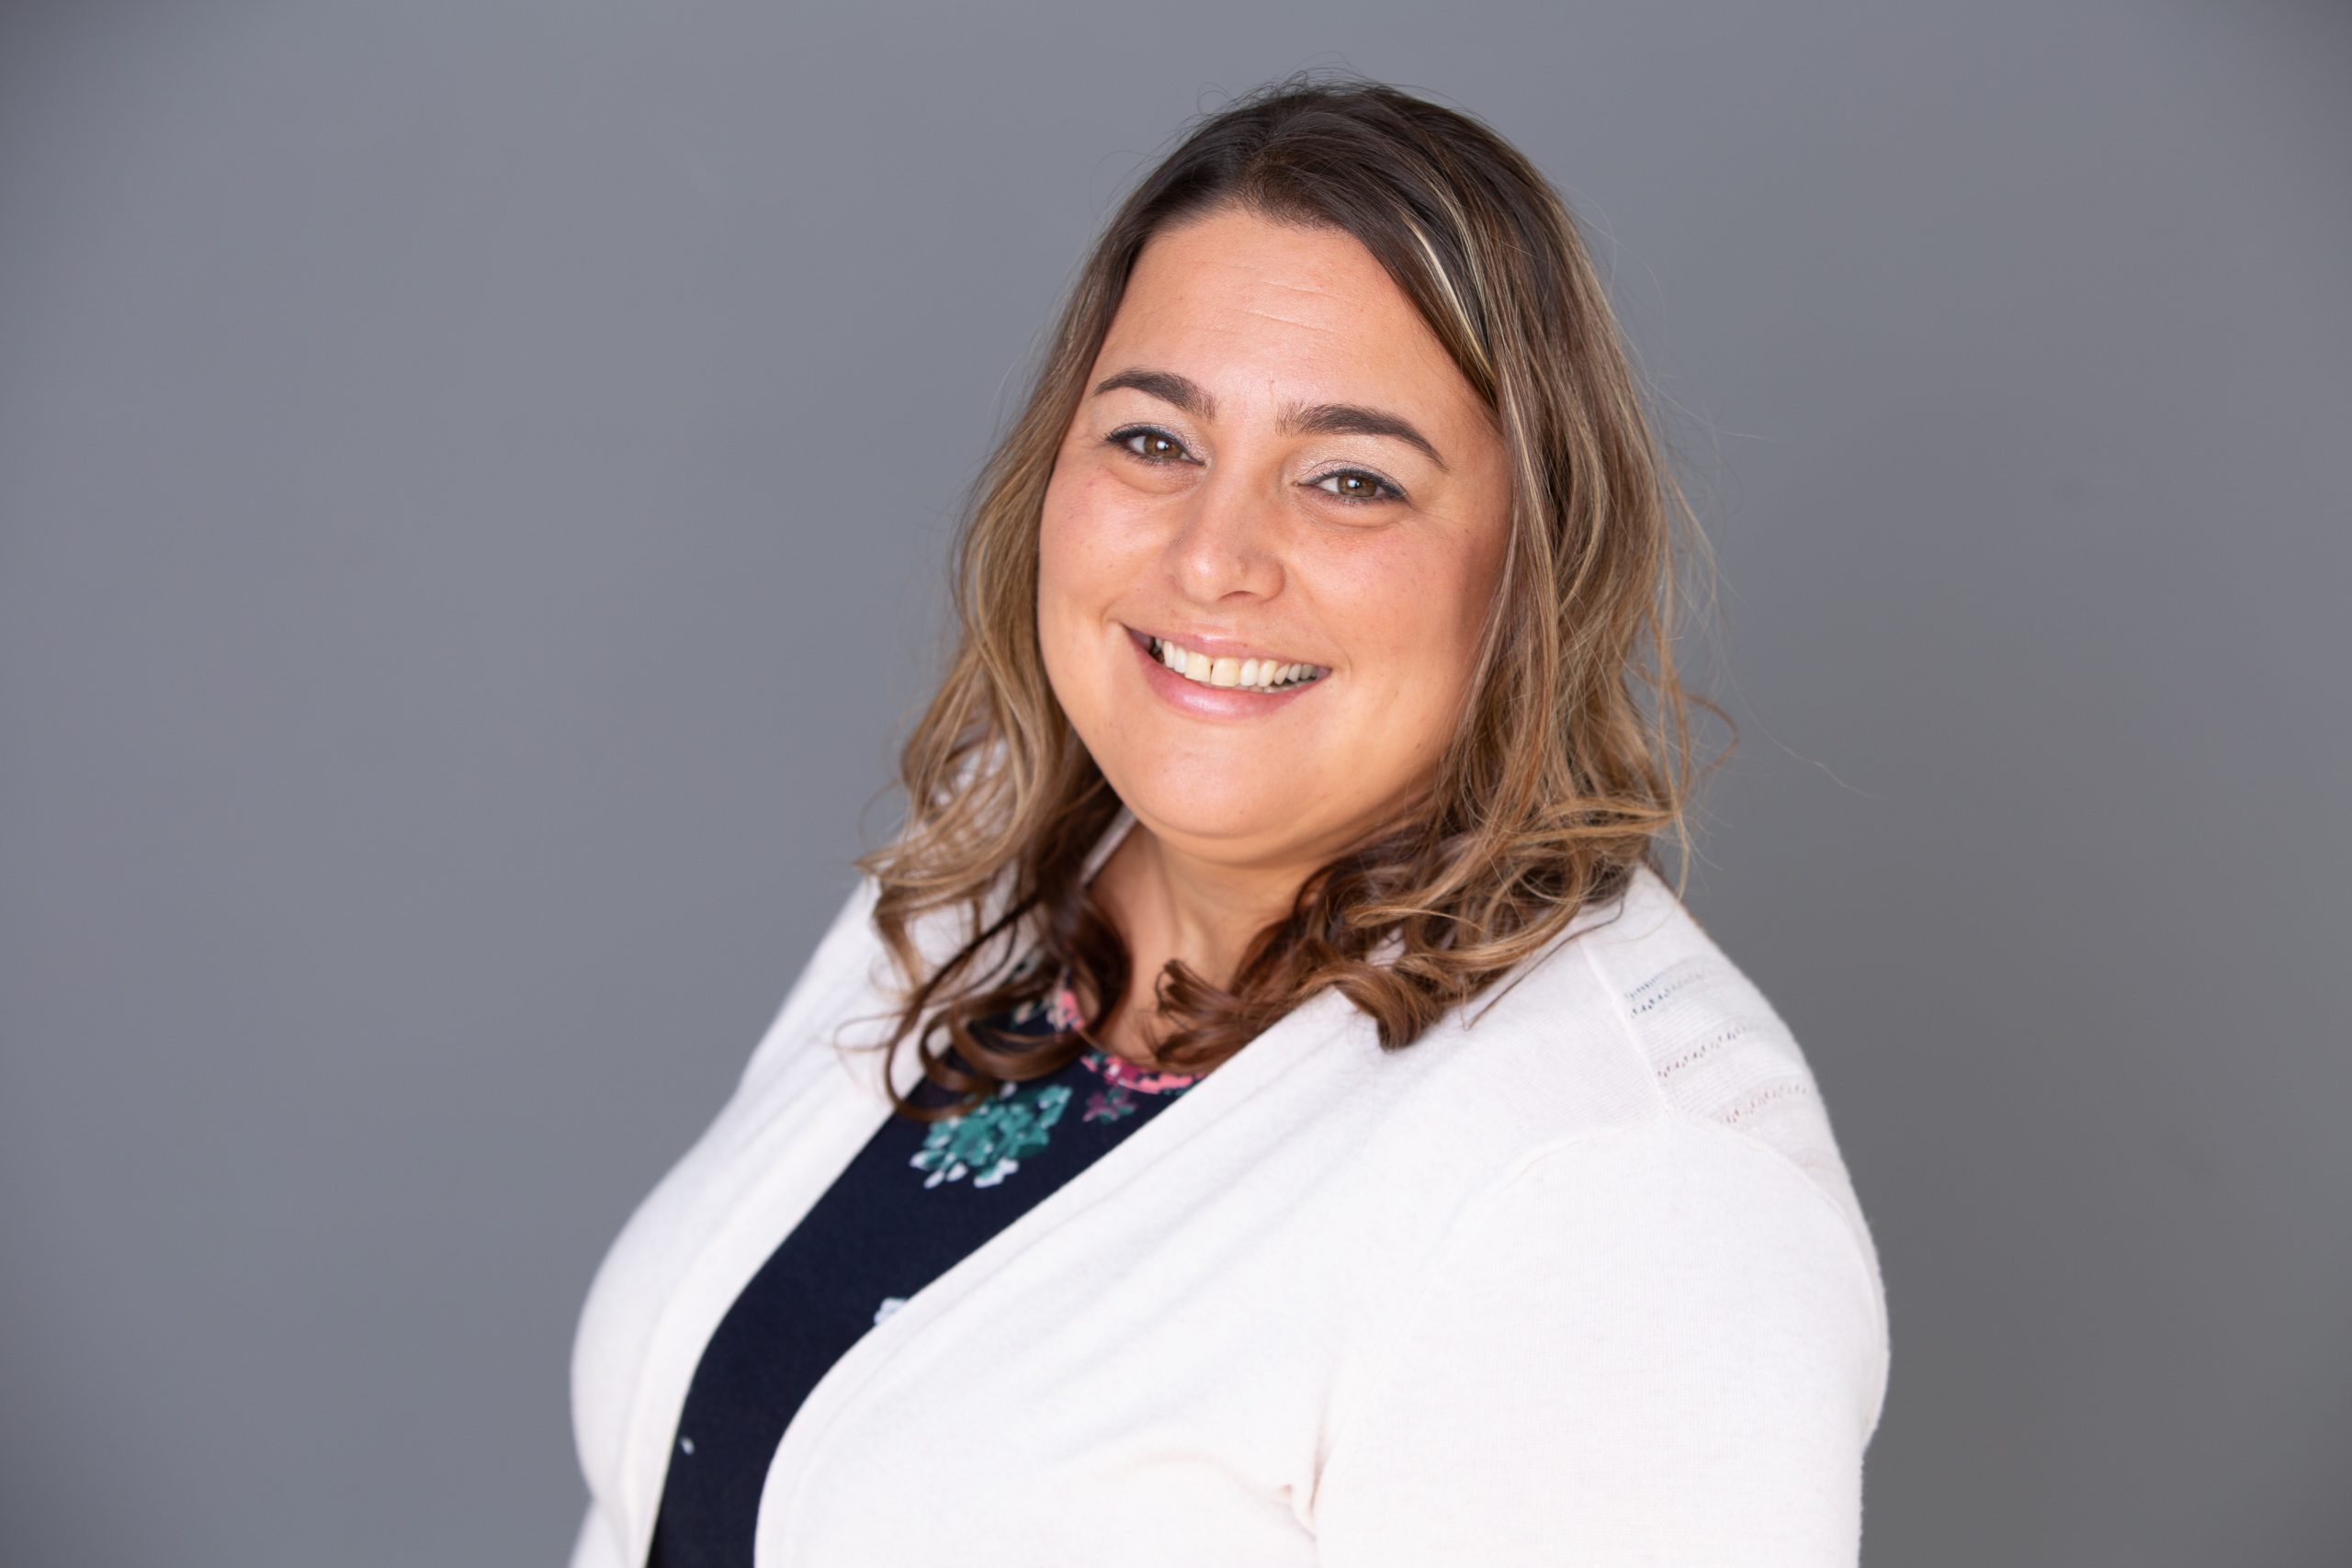 Jennifer Spinler, Intern Therapist